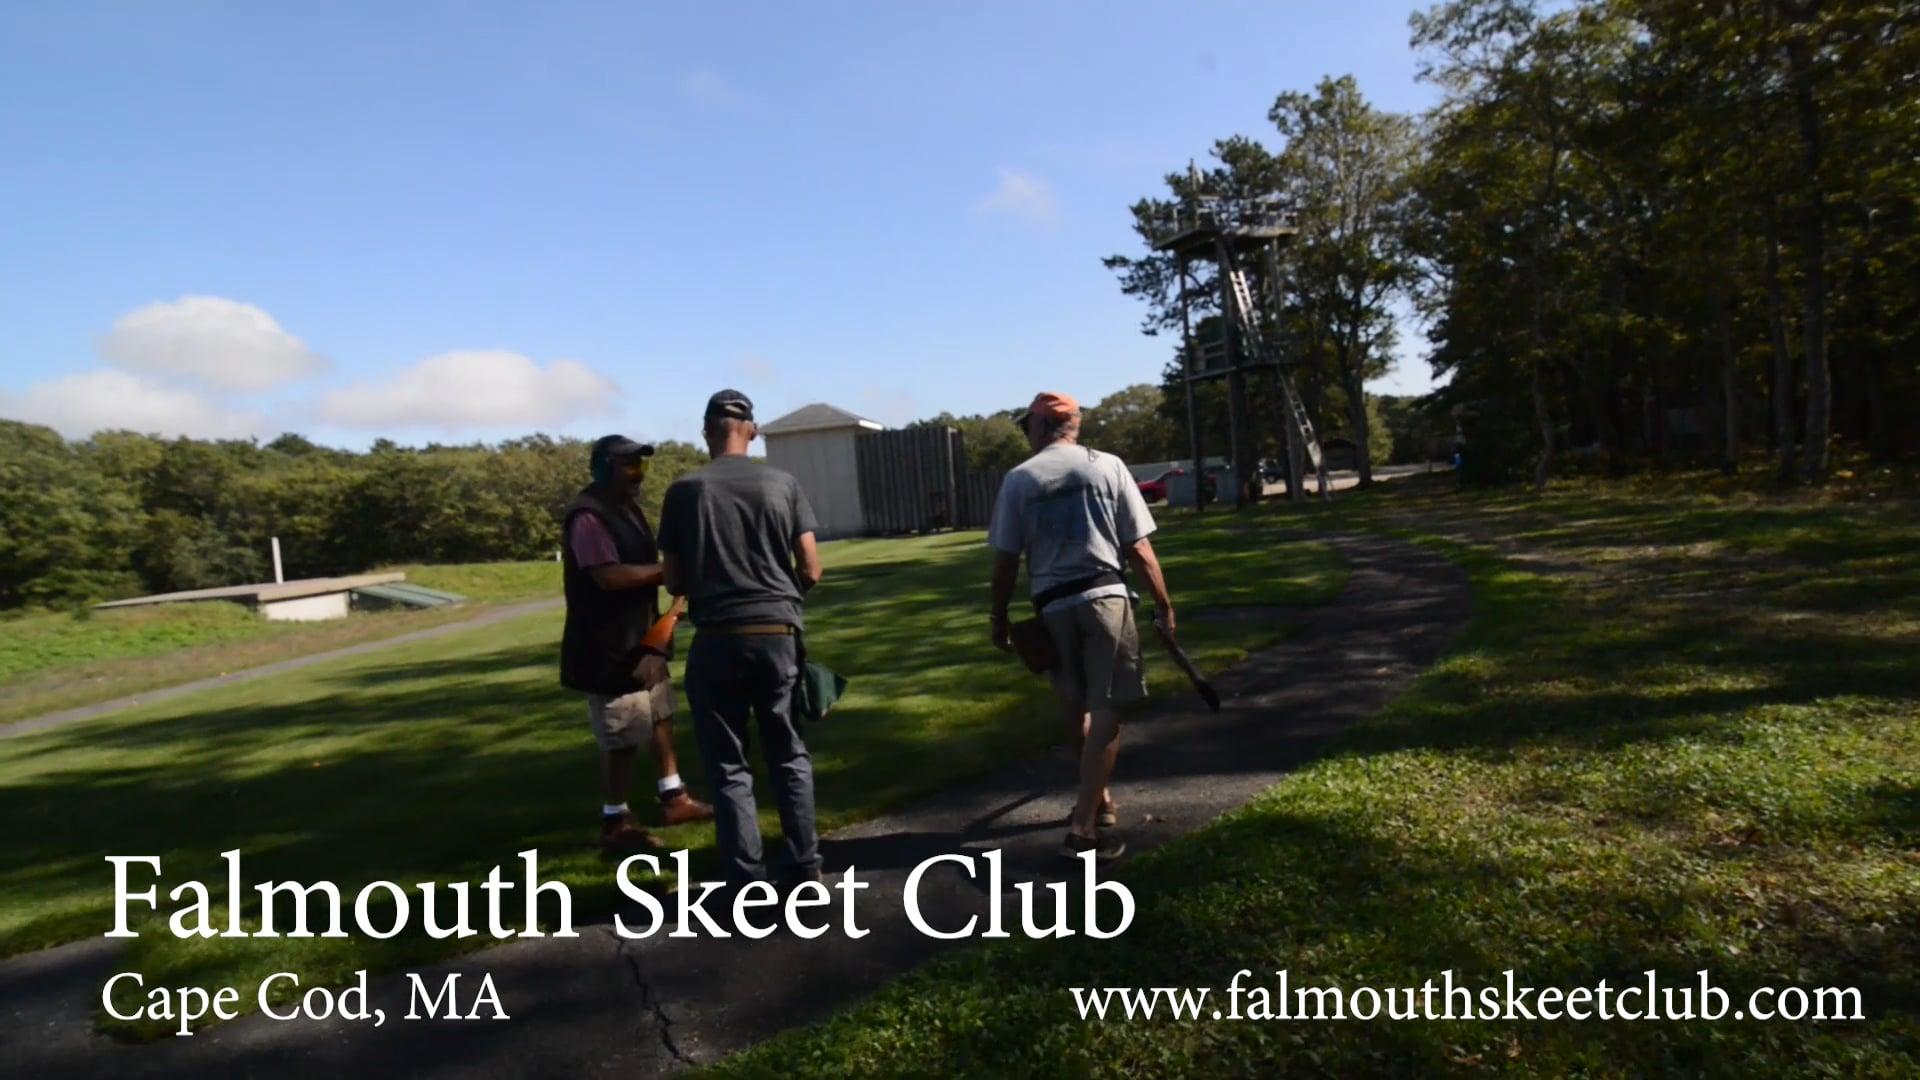 Falmouth Skeet Club Channel